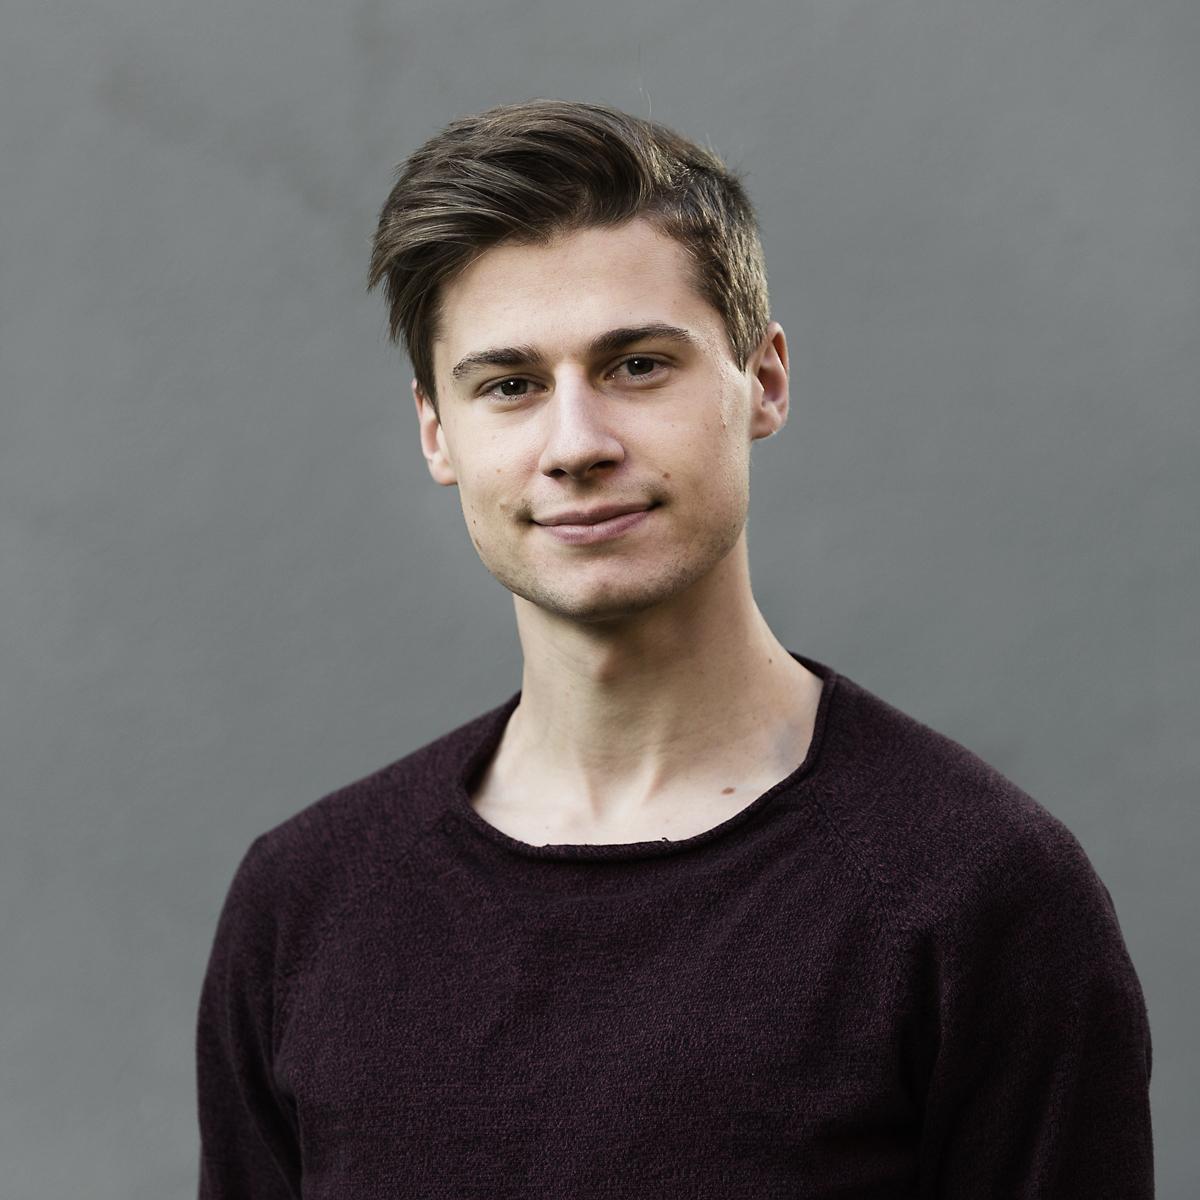 Theodor Molander - director / VFX0708875908